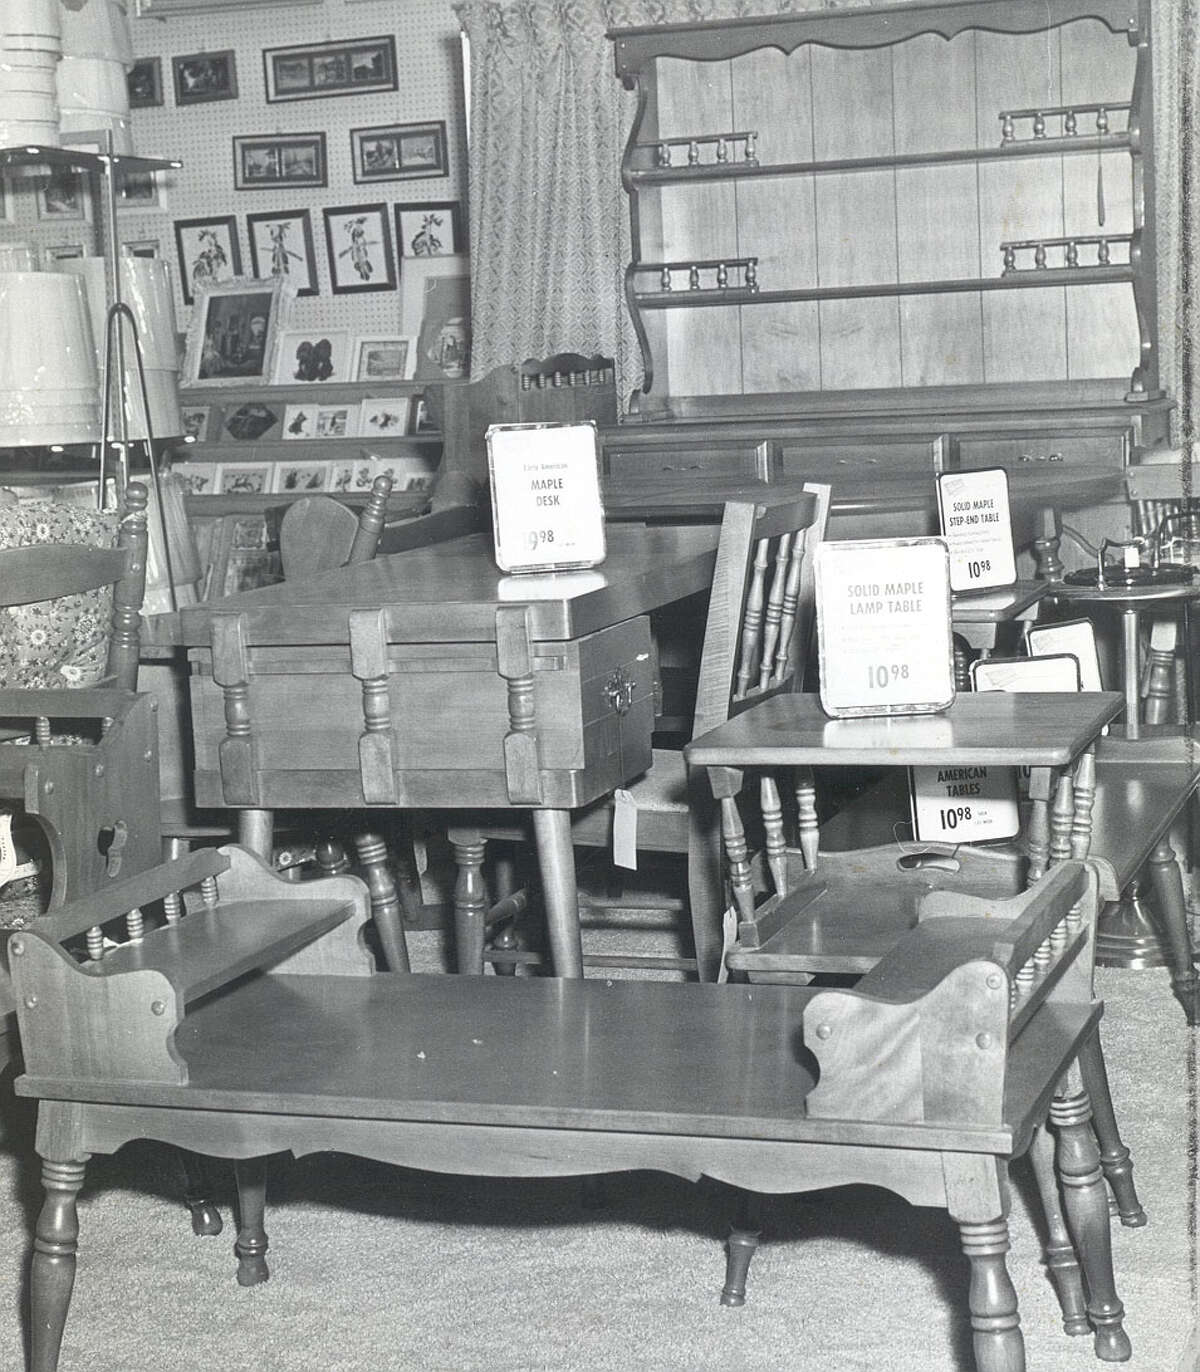 W.T. Grant Furniture at Stuyvesant Plaza, 1959.